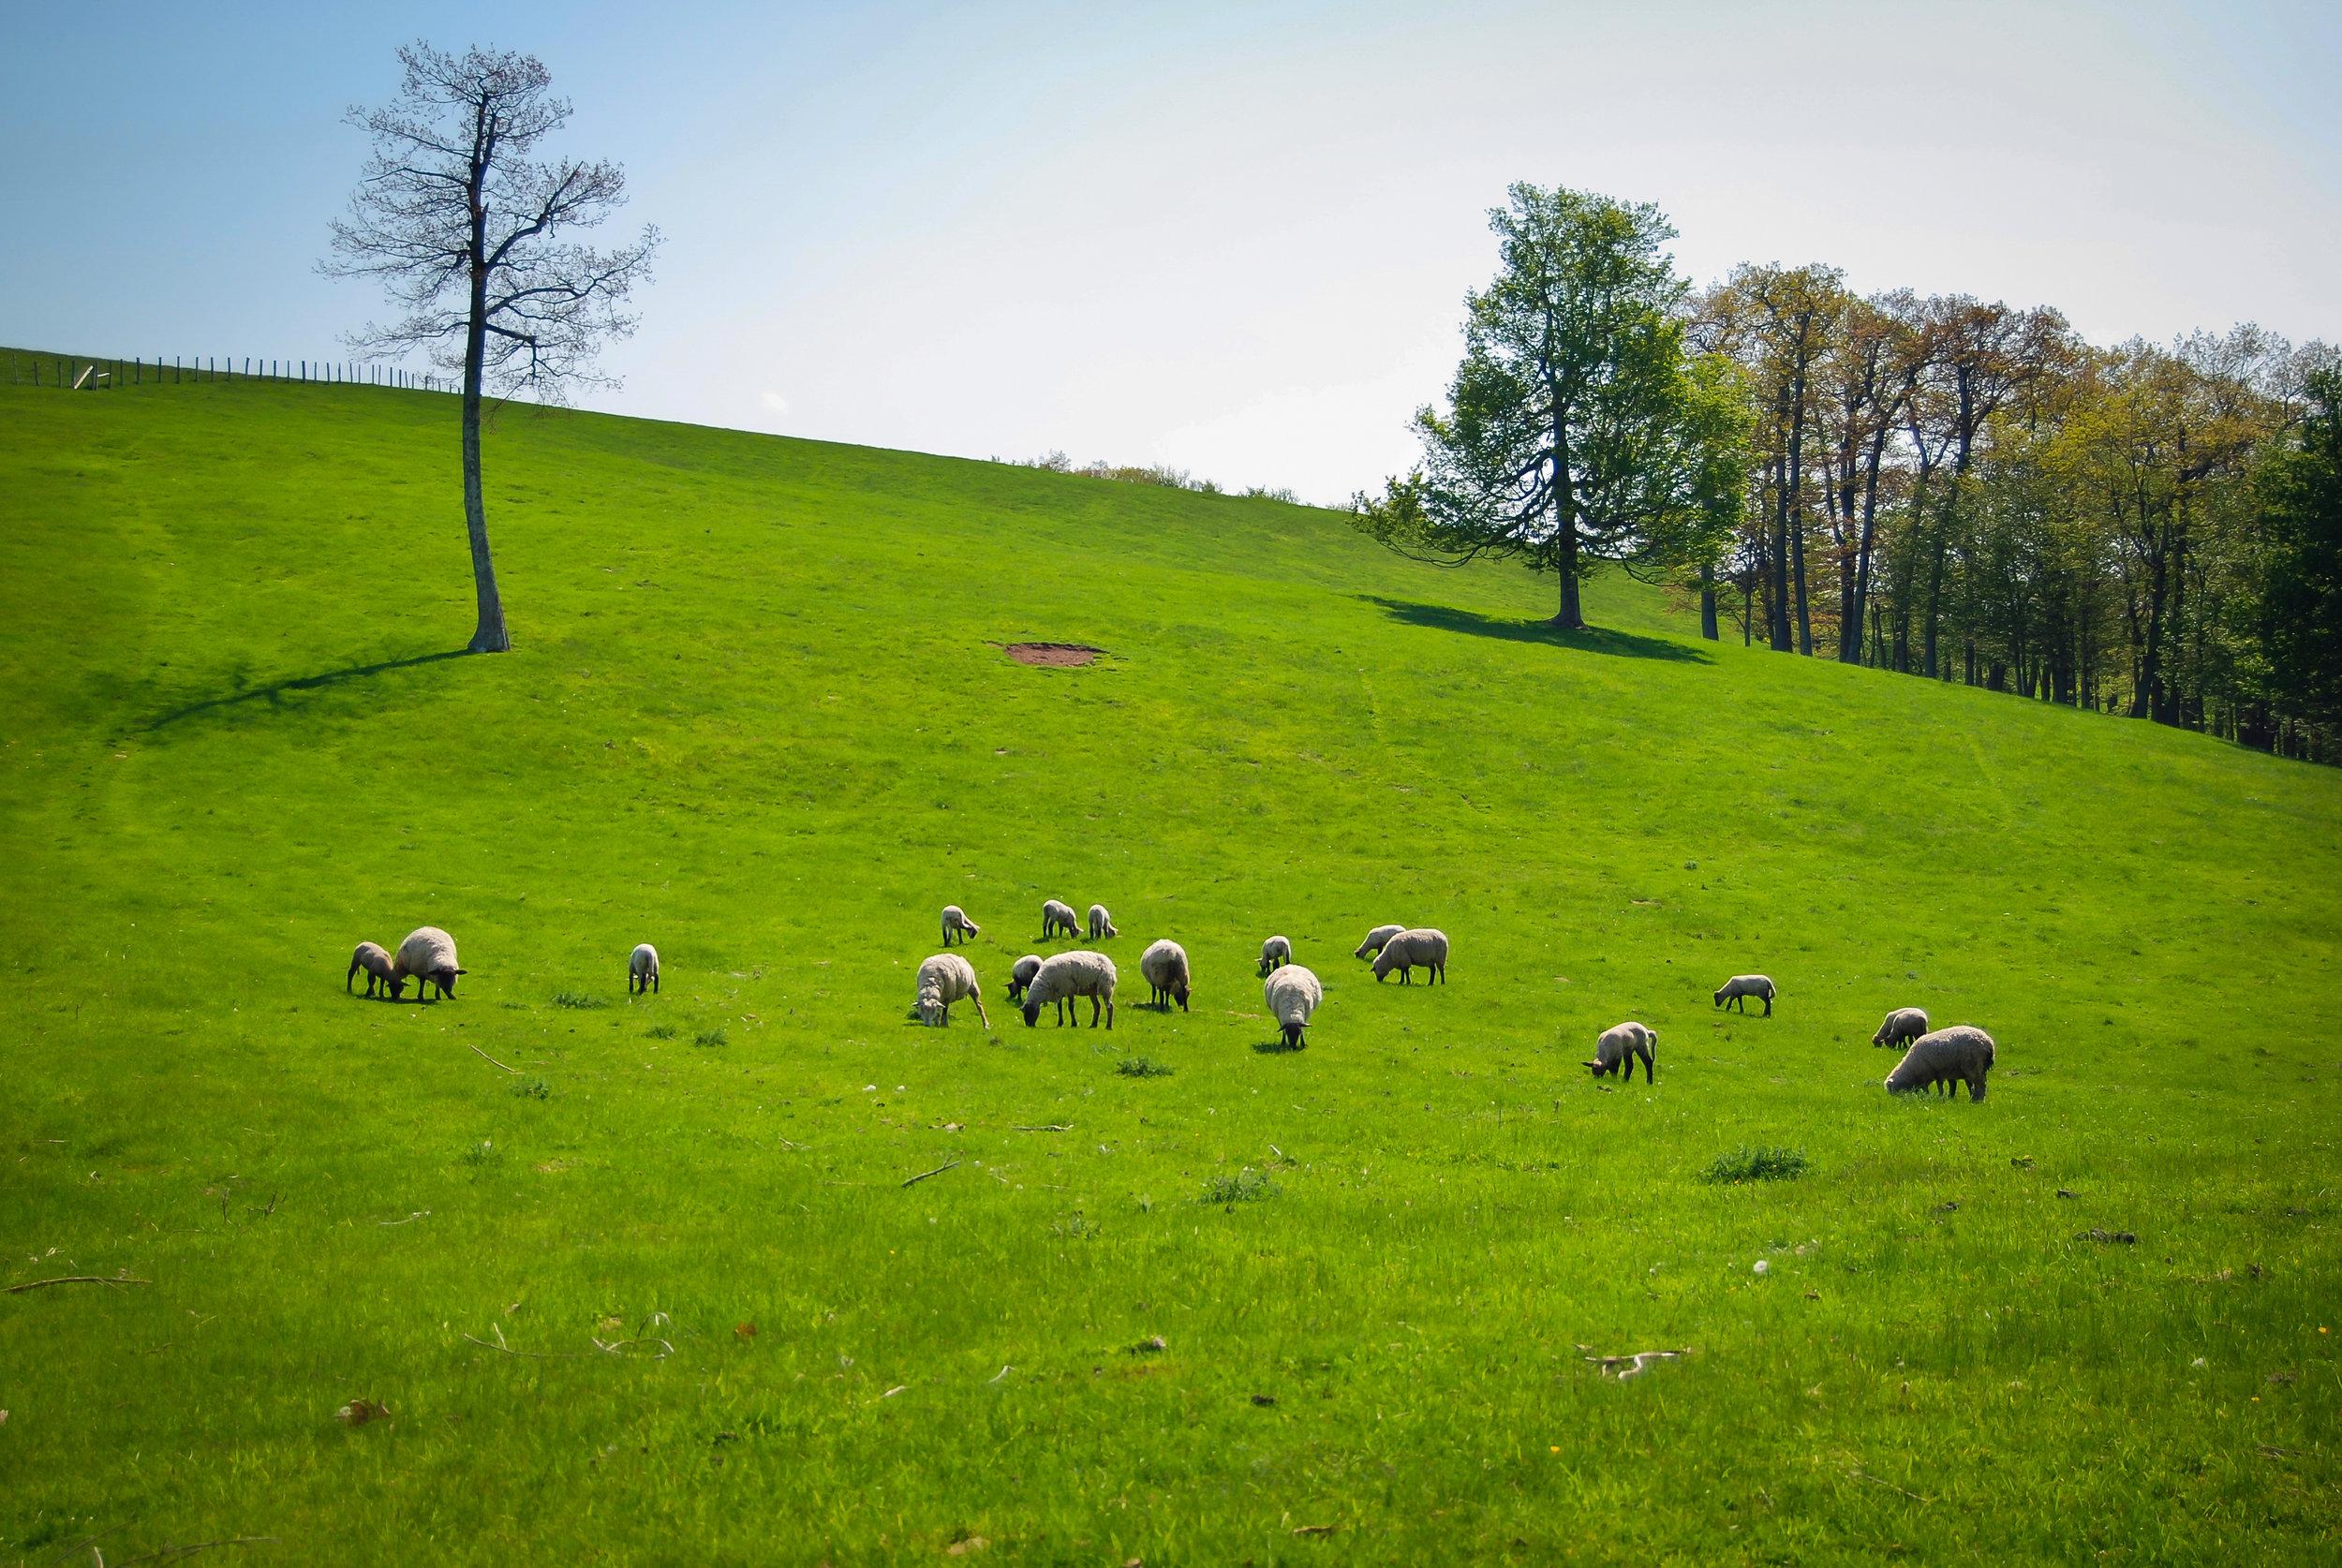 sheep-hill-highland county-virginia.jpg